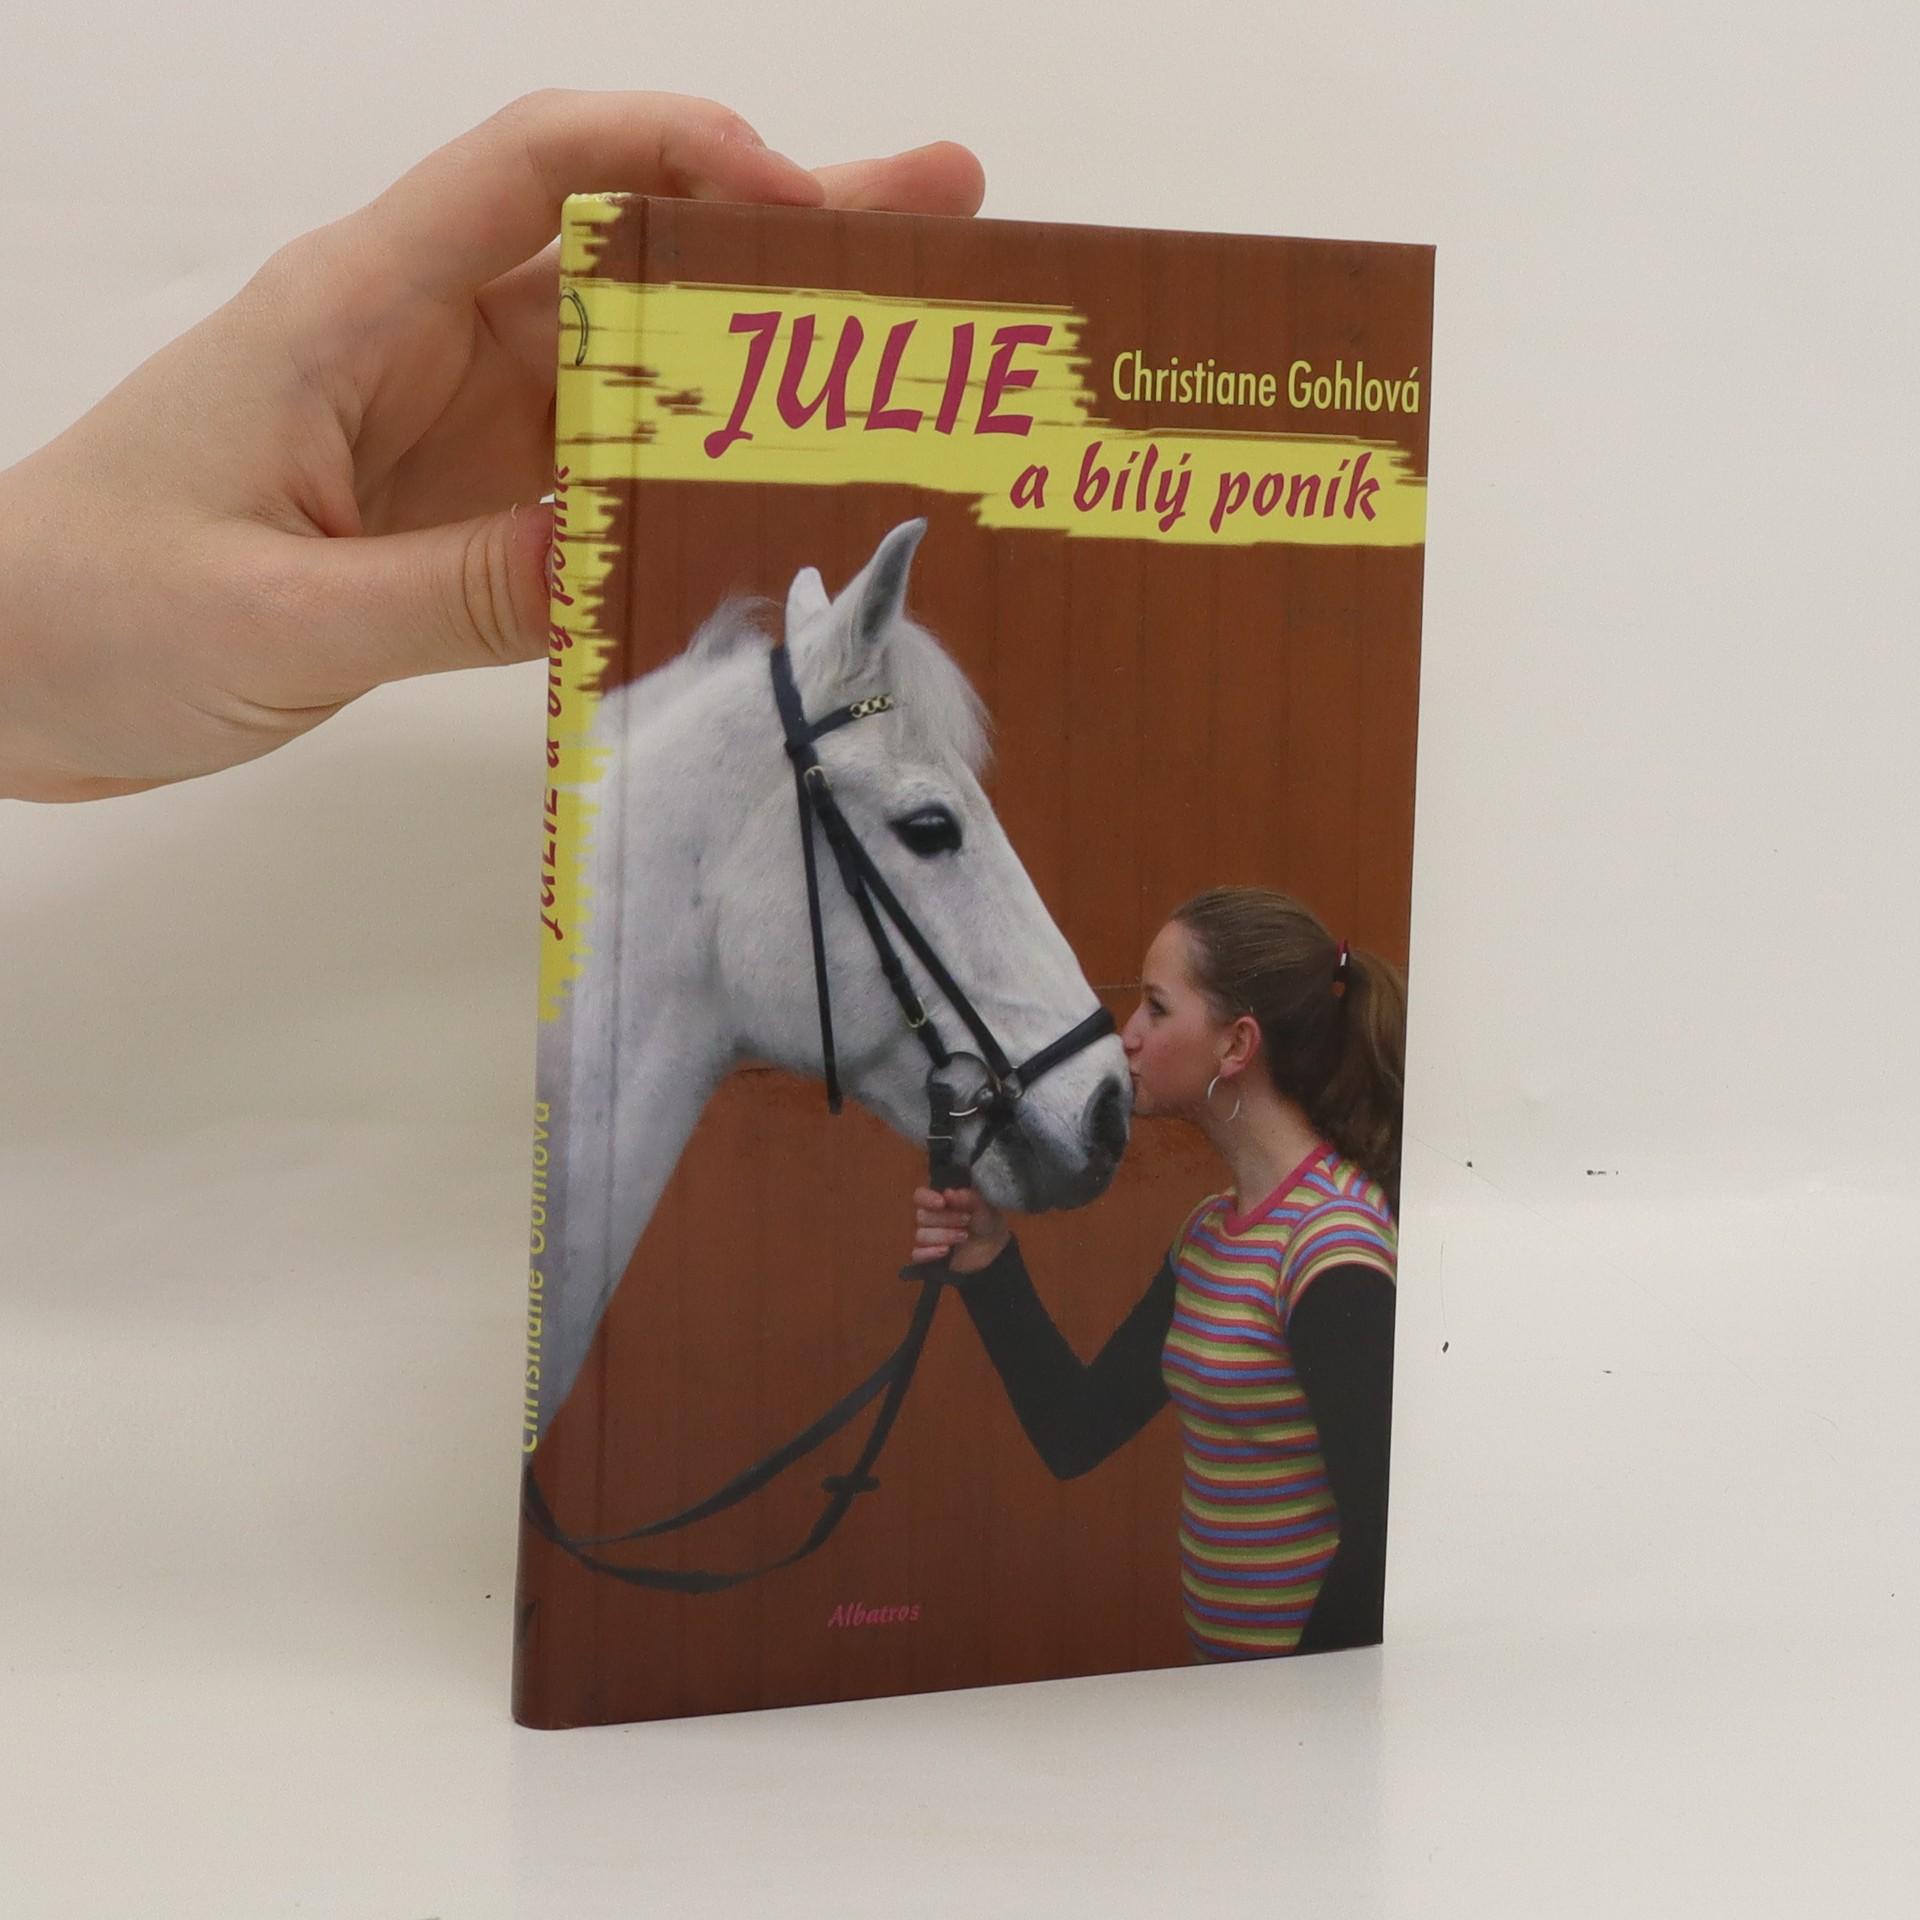 antikvární kniha Julie a bílý poník, 2009